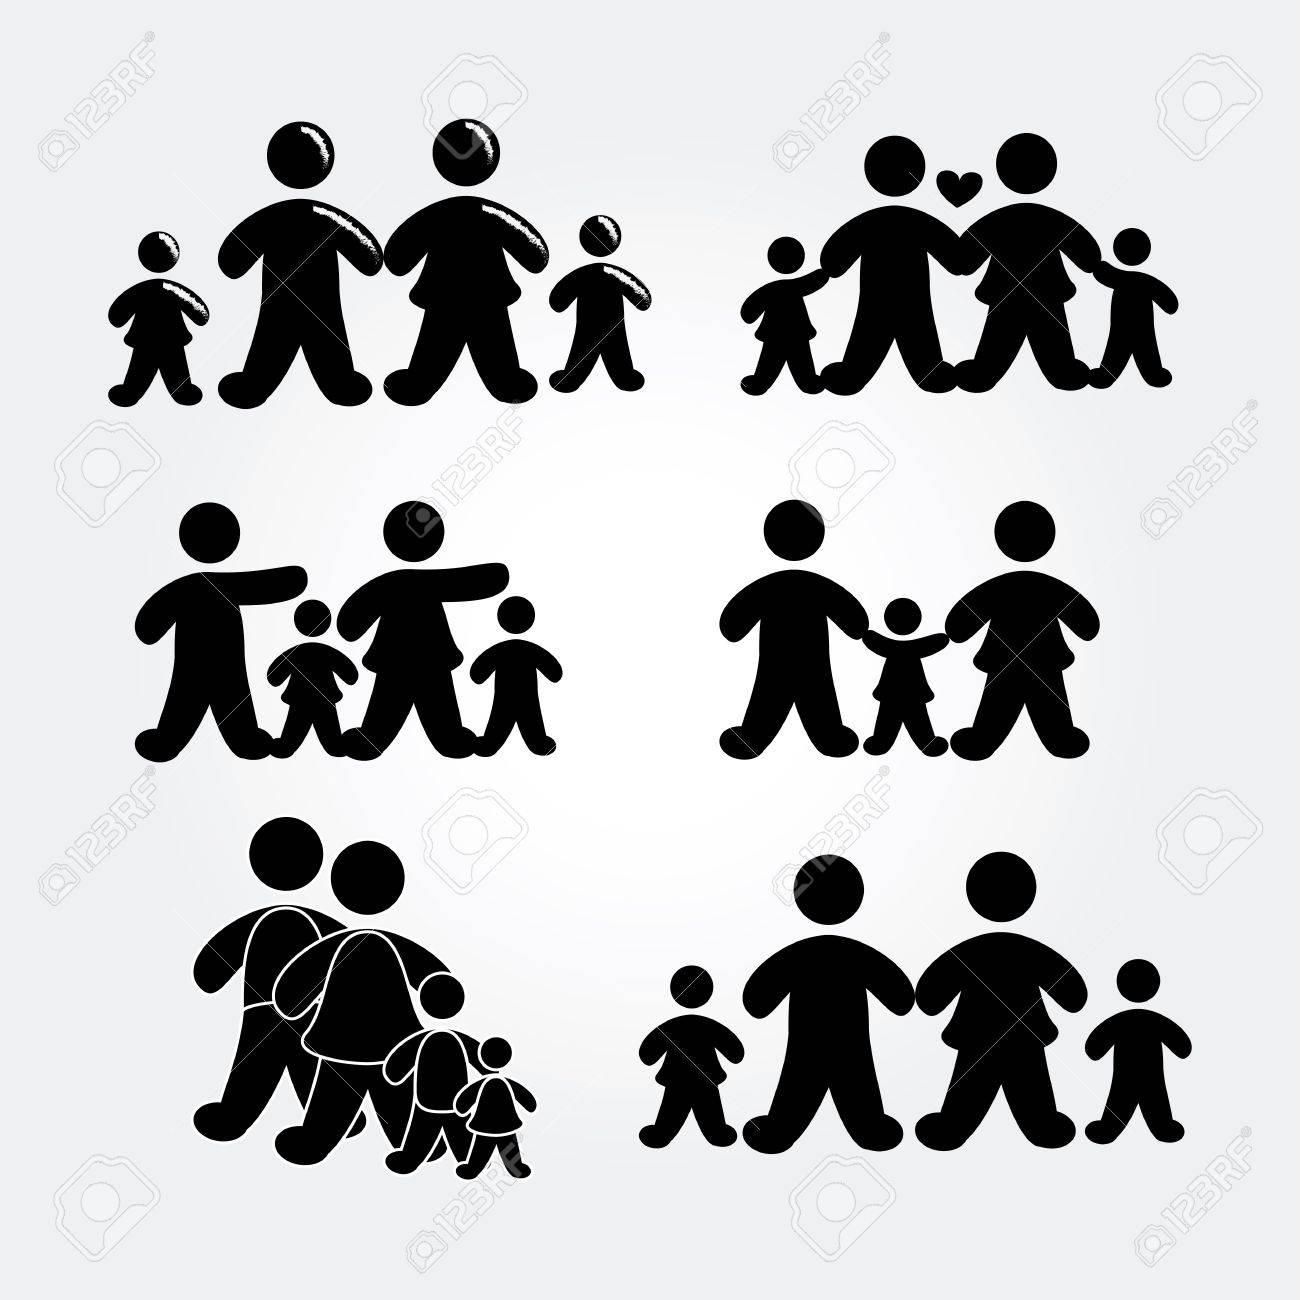 family silhouette over gray background illustration Stock Vector - 19772587